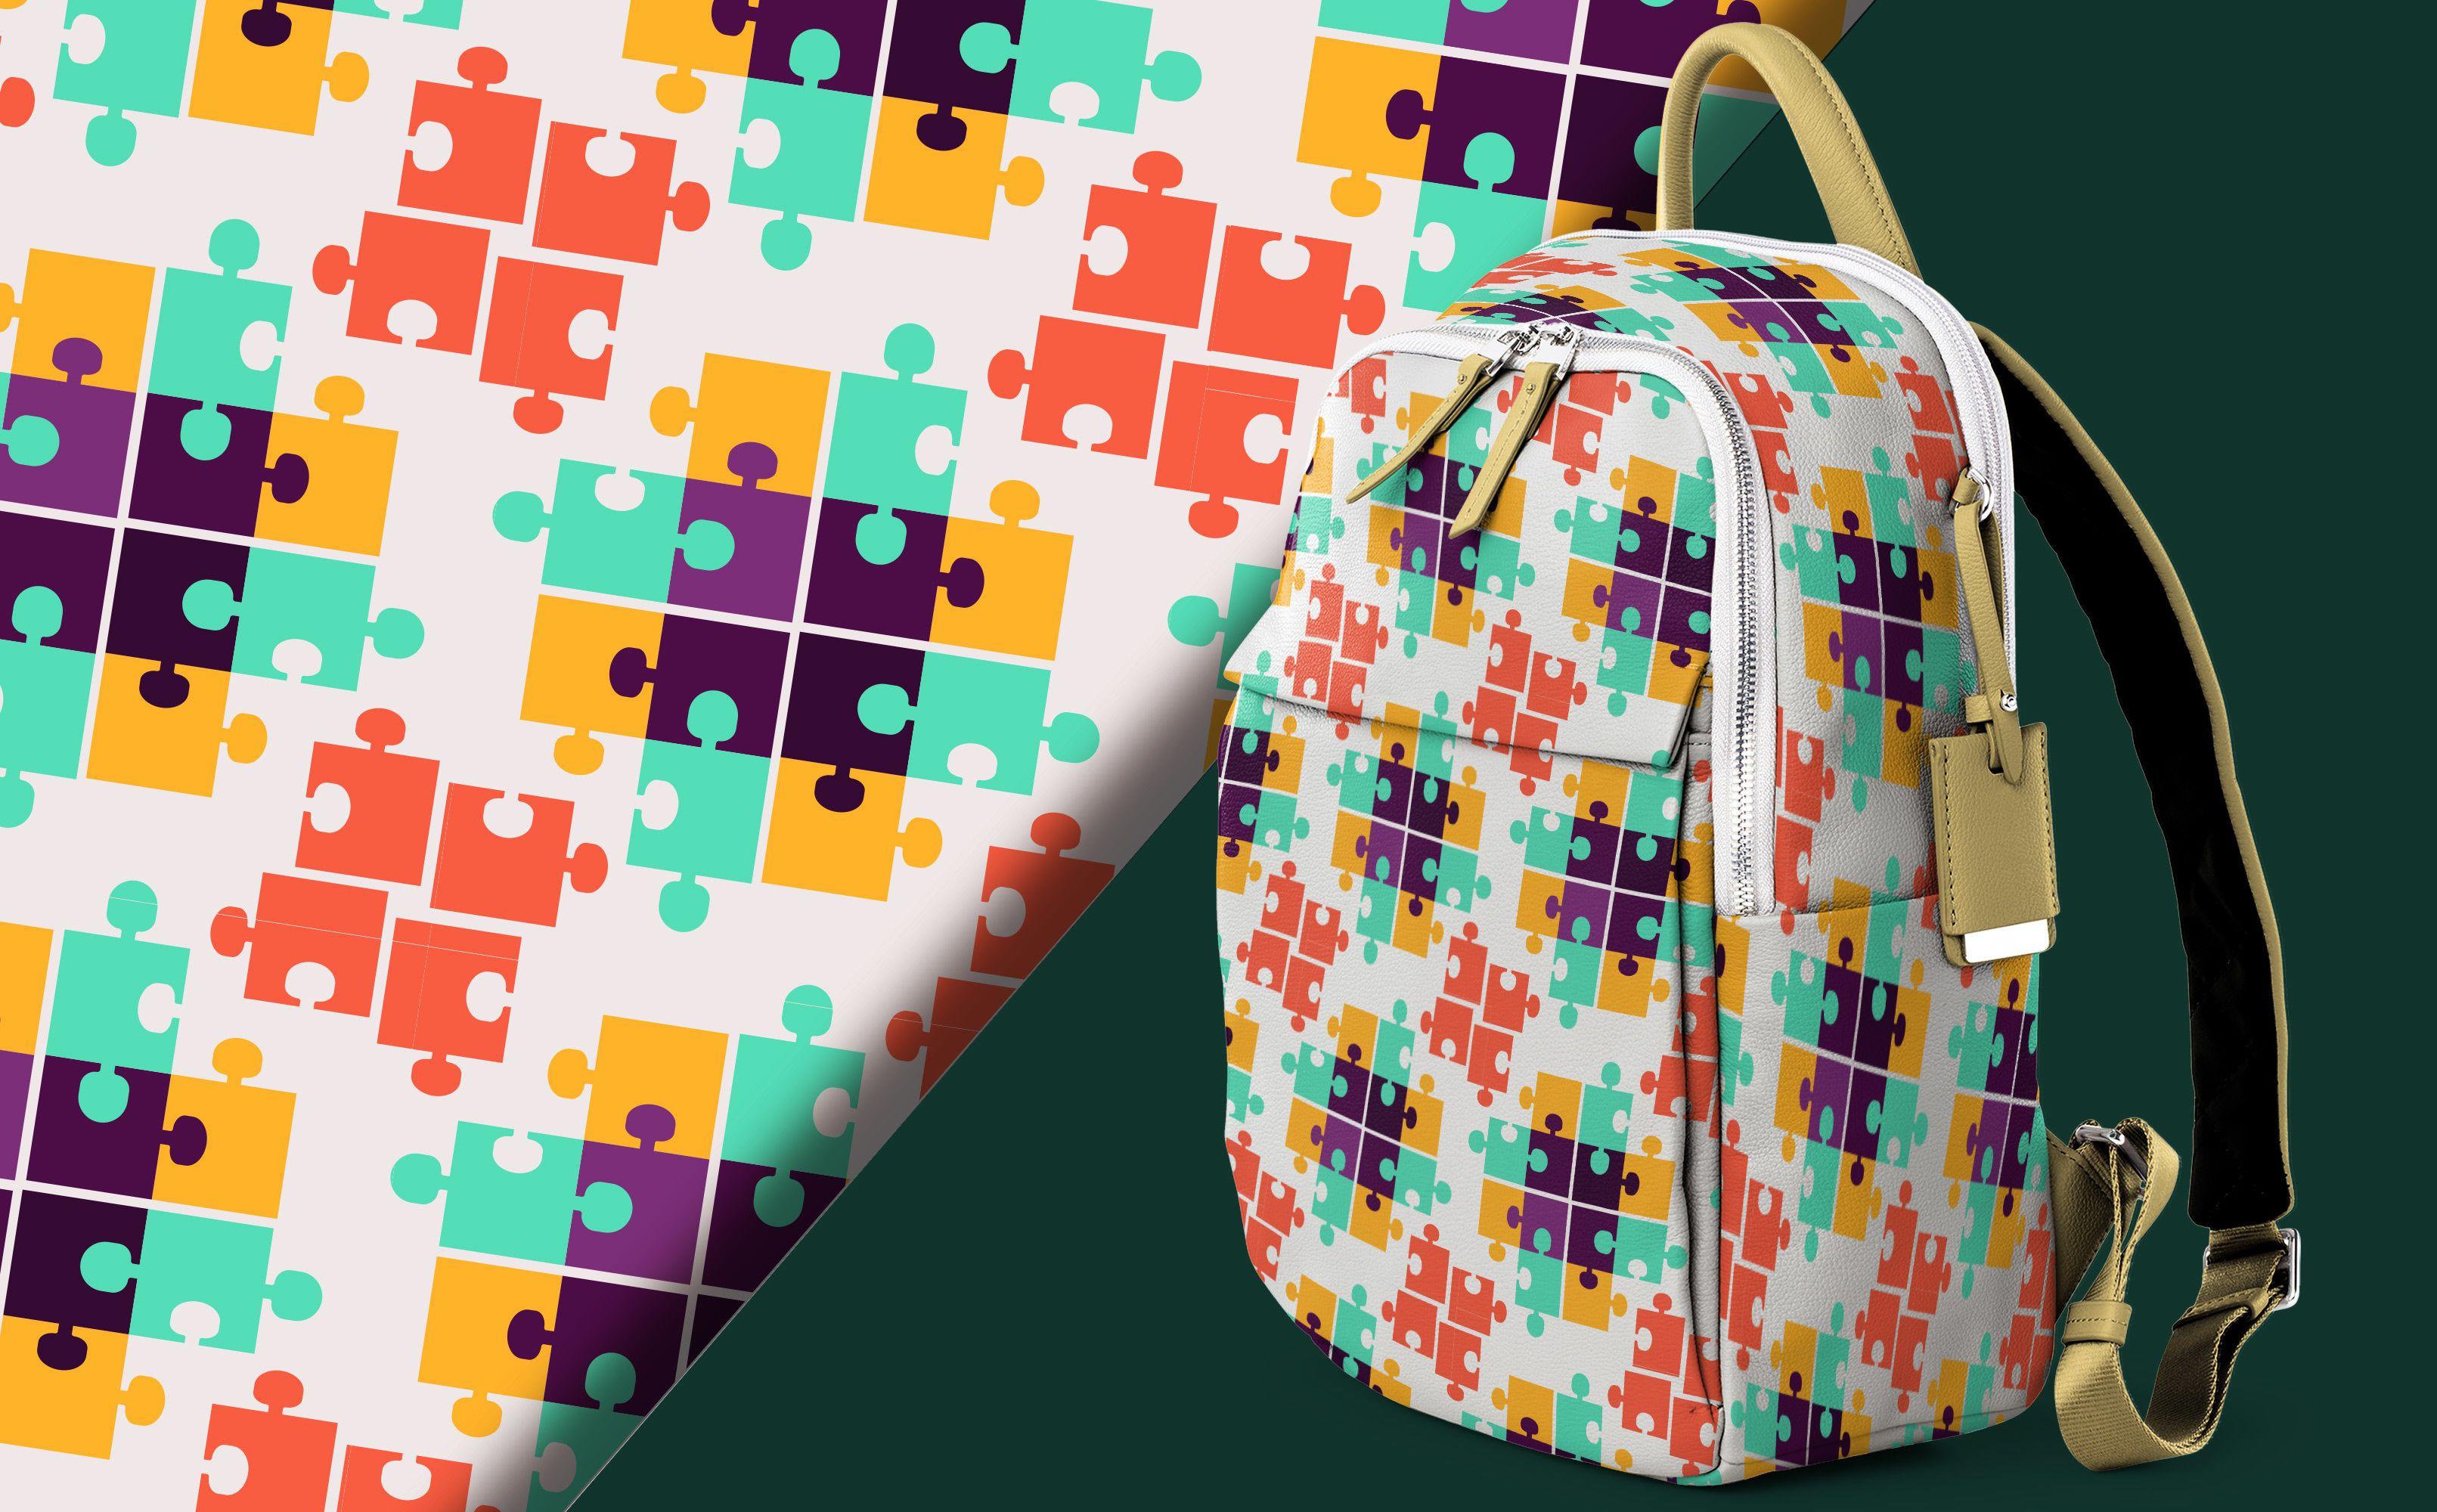 Colorful puzzle pattern design